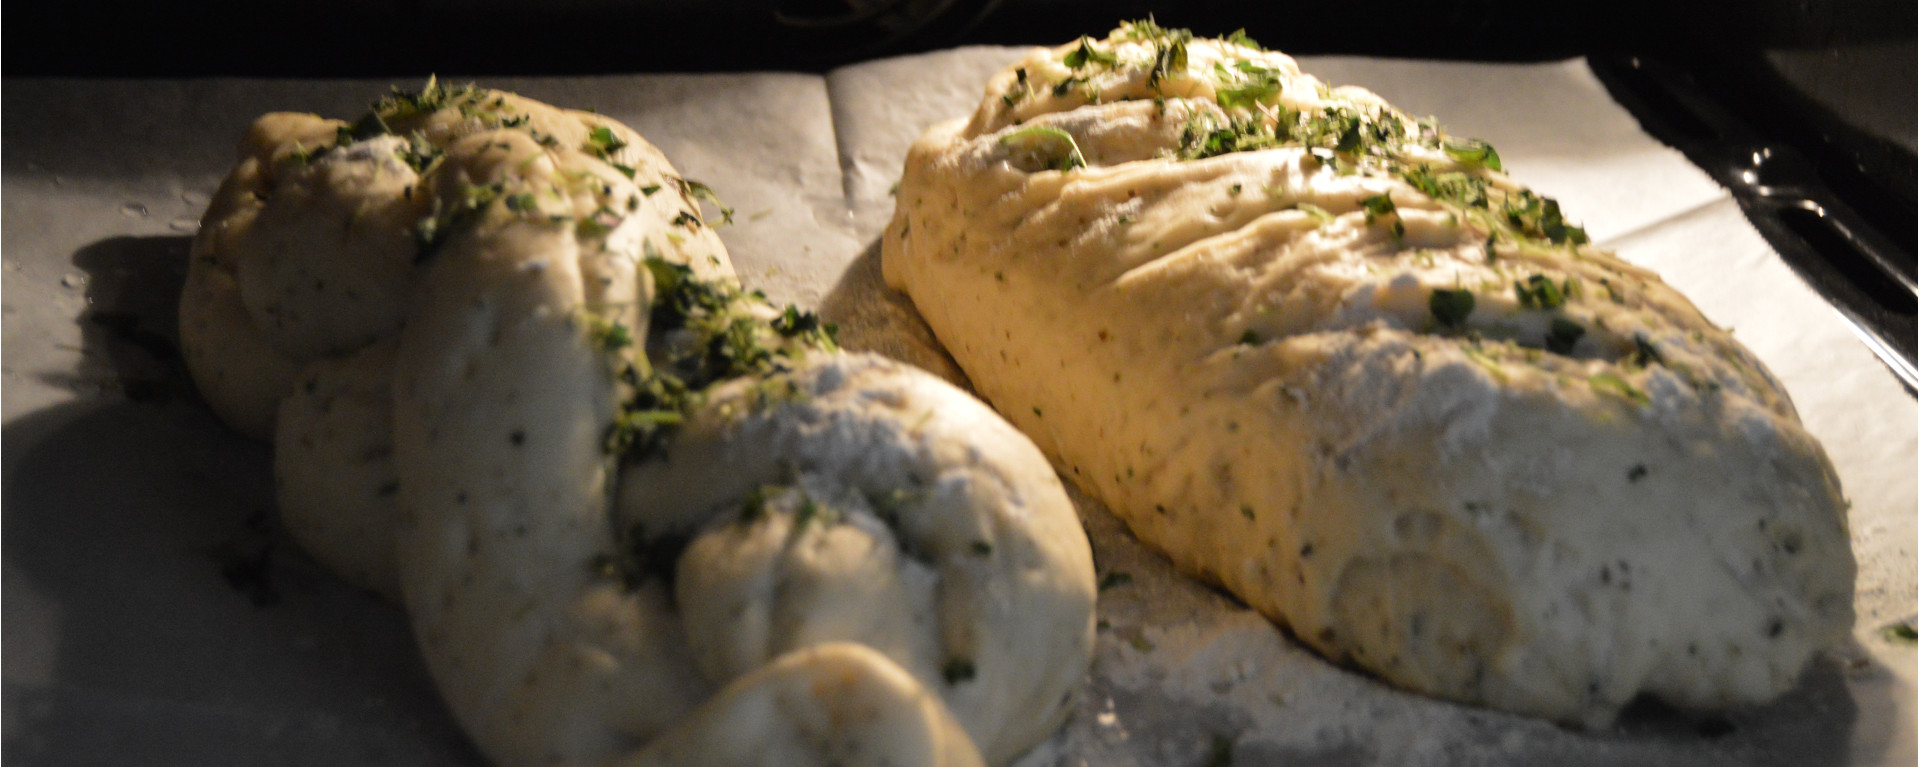 ChefNorway's Oregano Bread